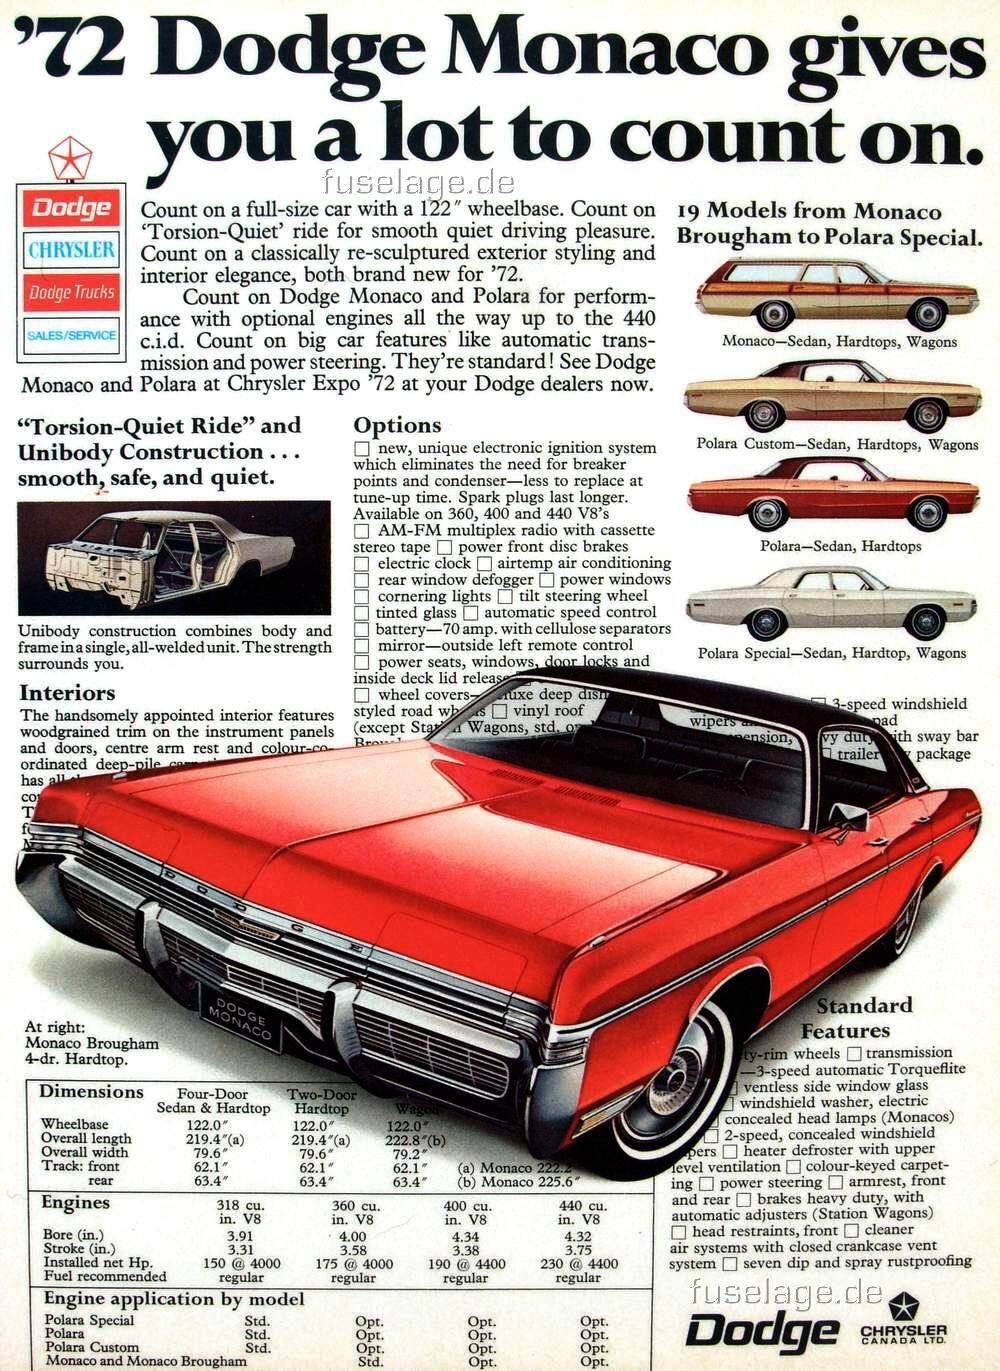 for the 1972 Dodge Monaco,